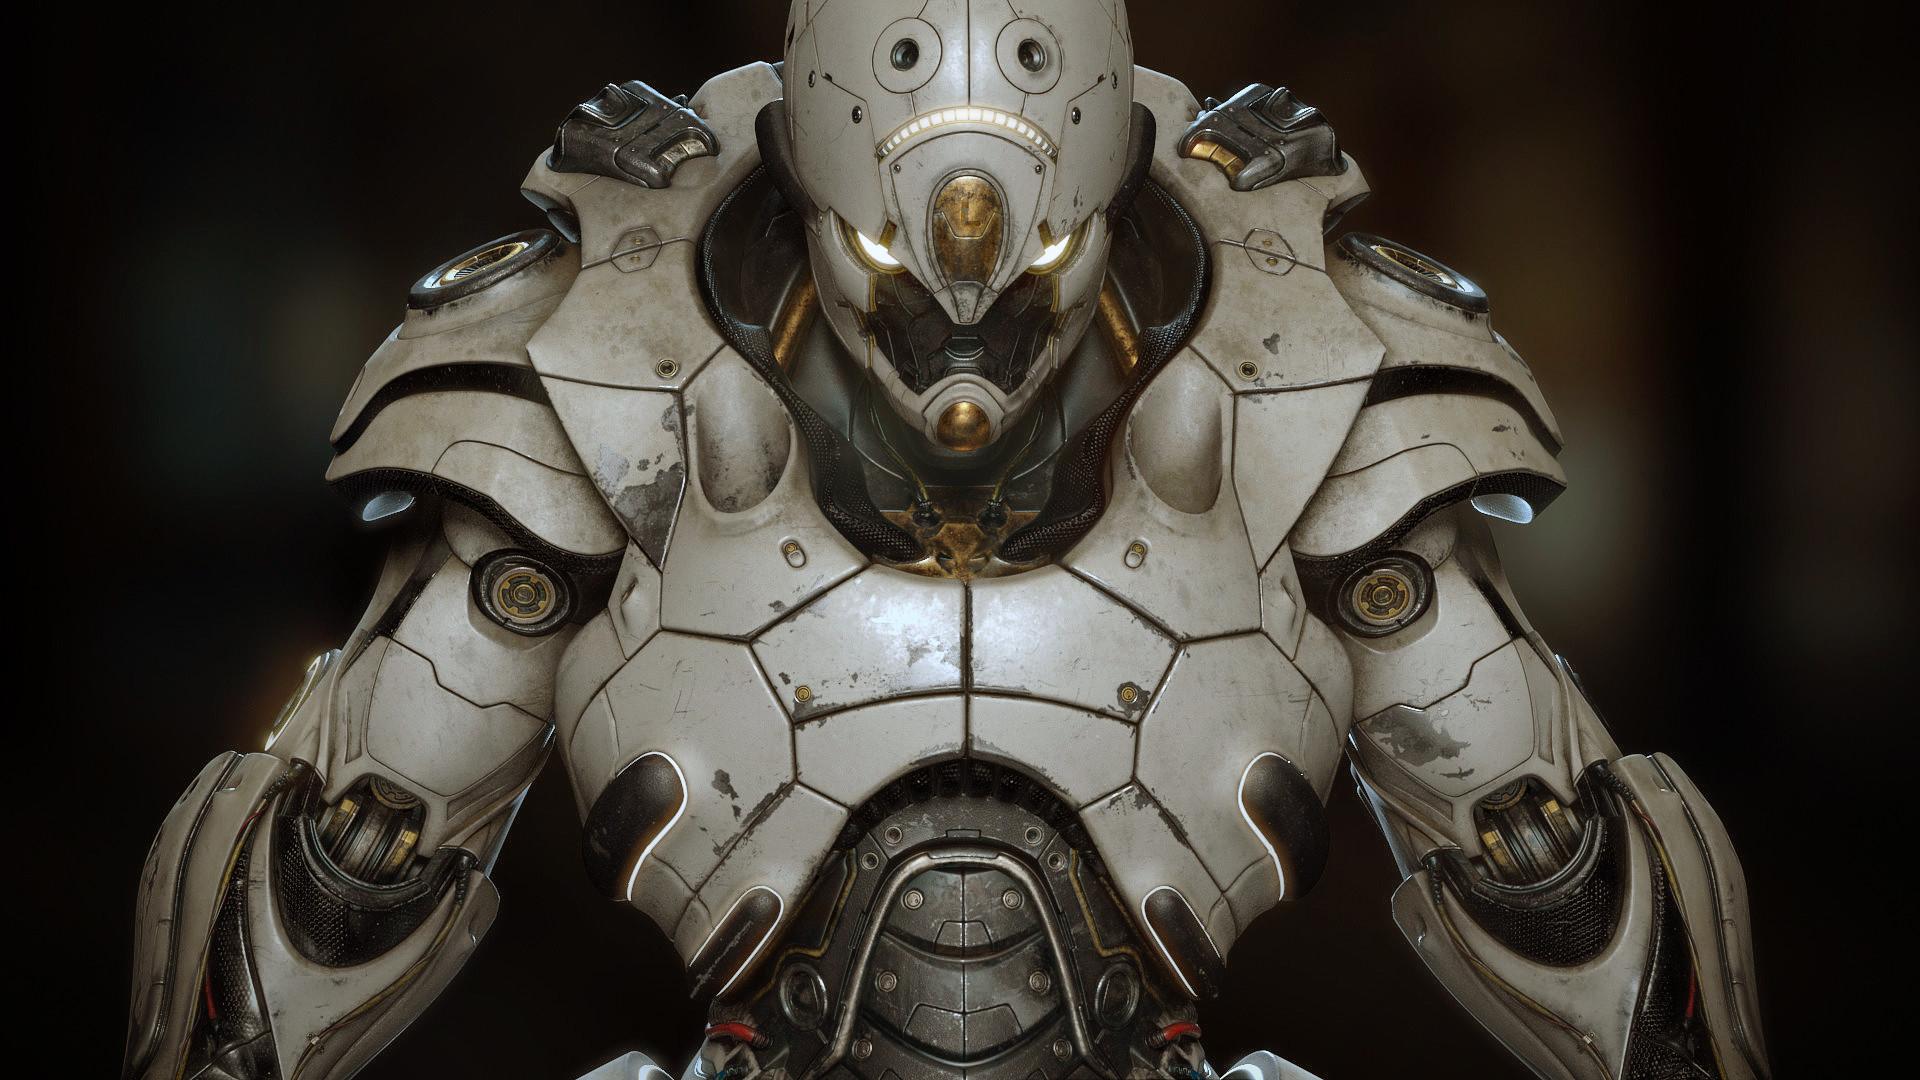 The 3d Robot Art of David Letondor